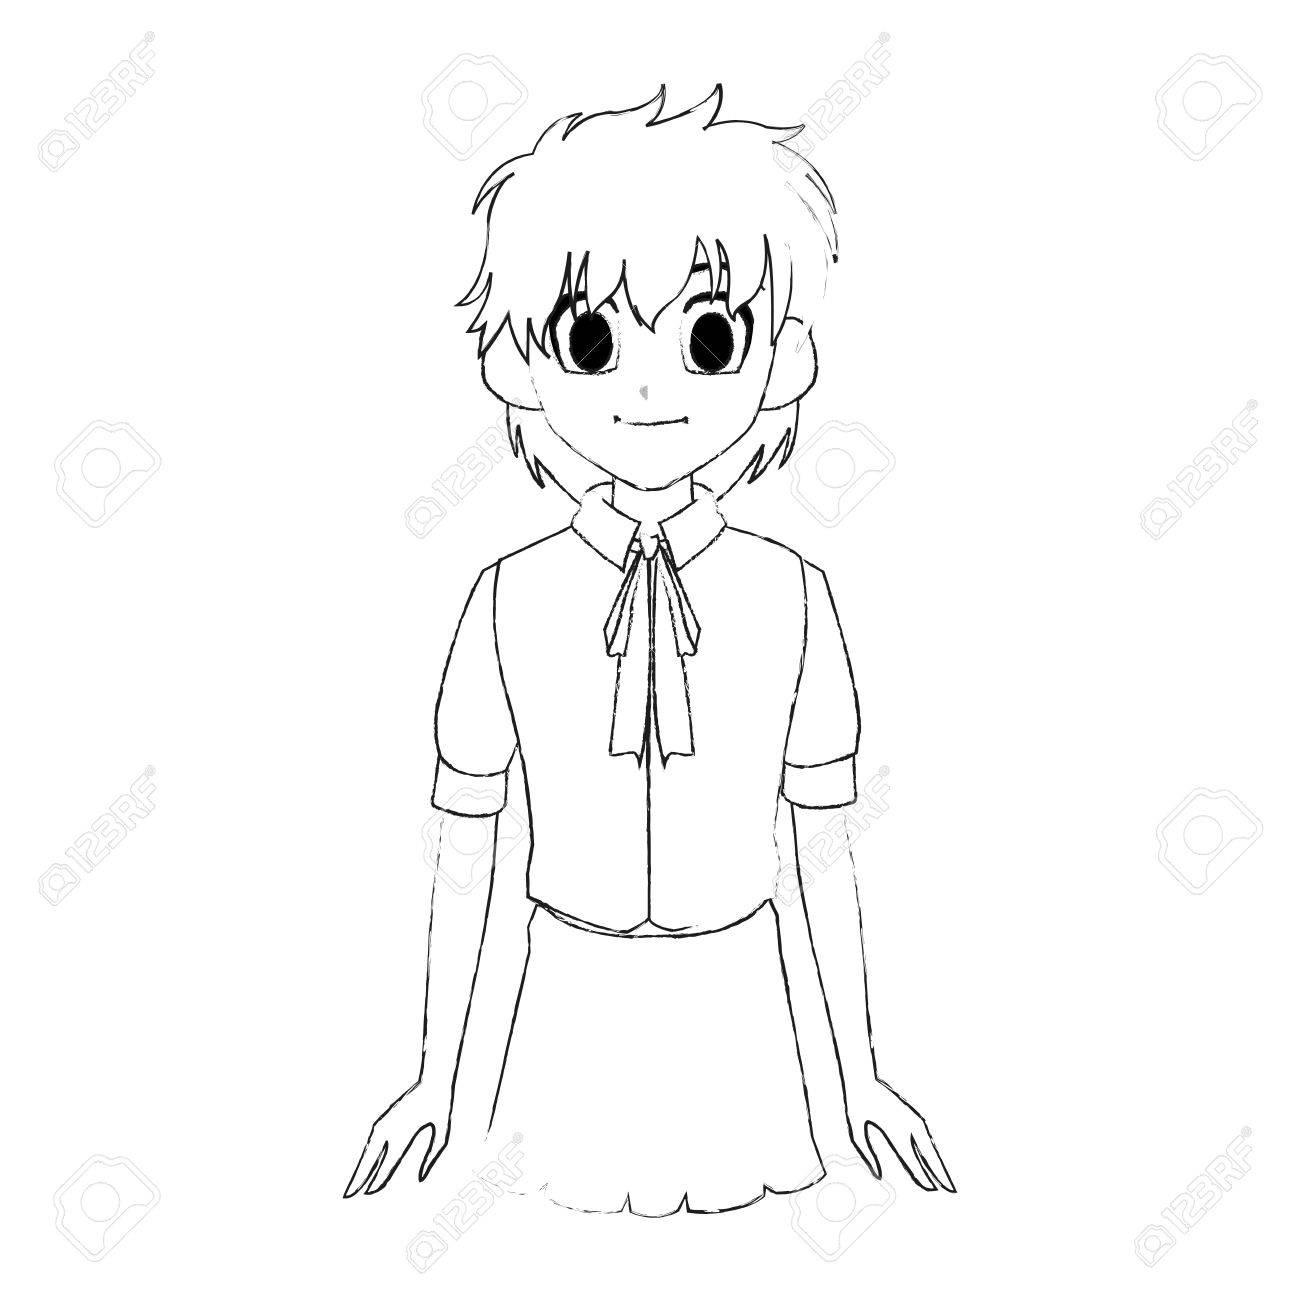 1300x1300 Cute Young Girl With Short Scruffy Hair Wearing School Uniform